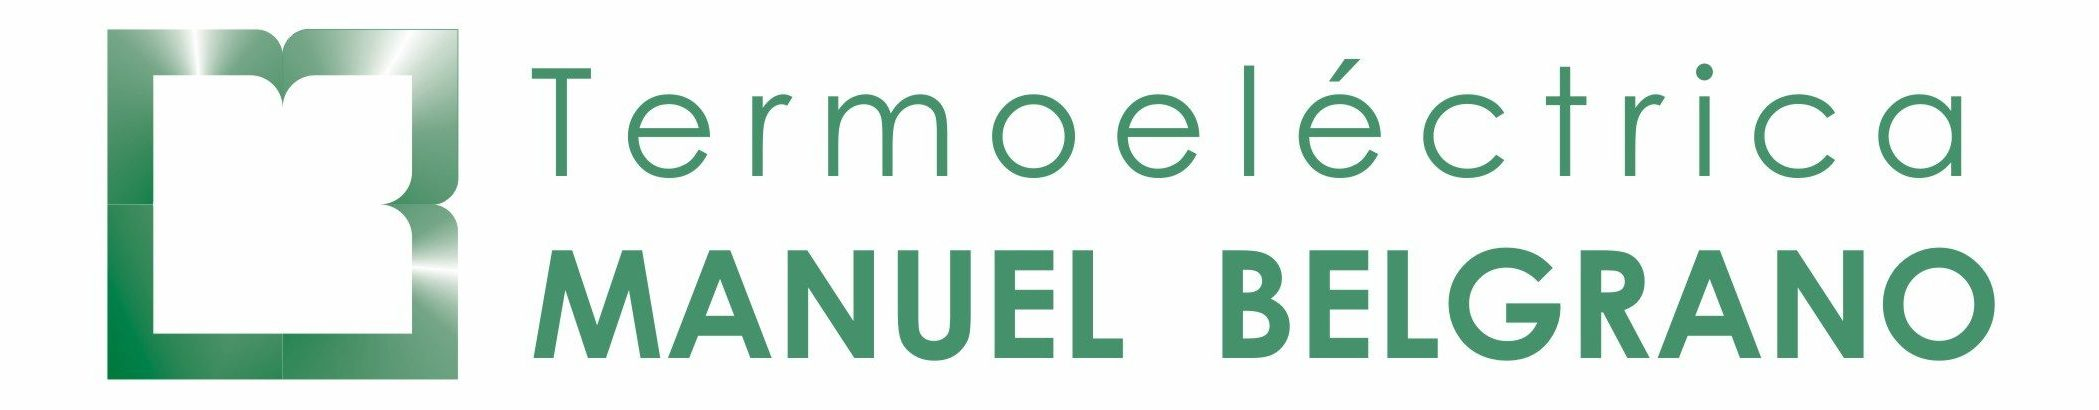 Termoeléctrica Manuel Belgrano